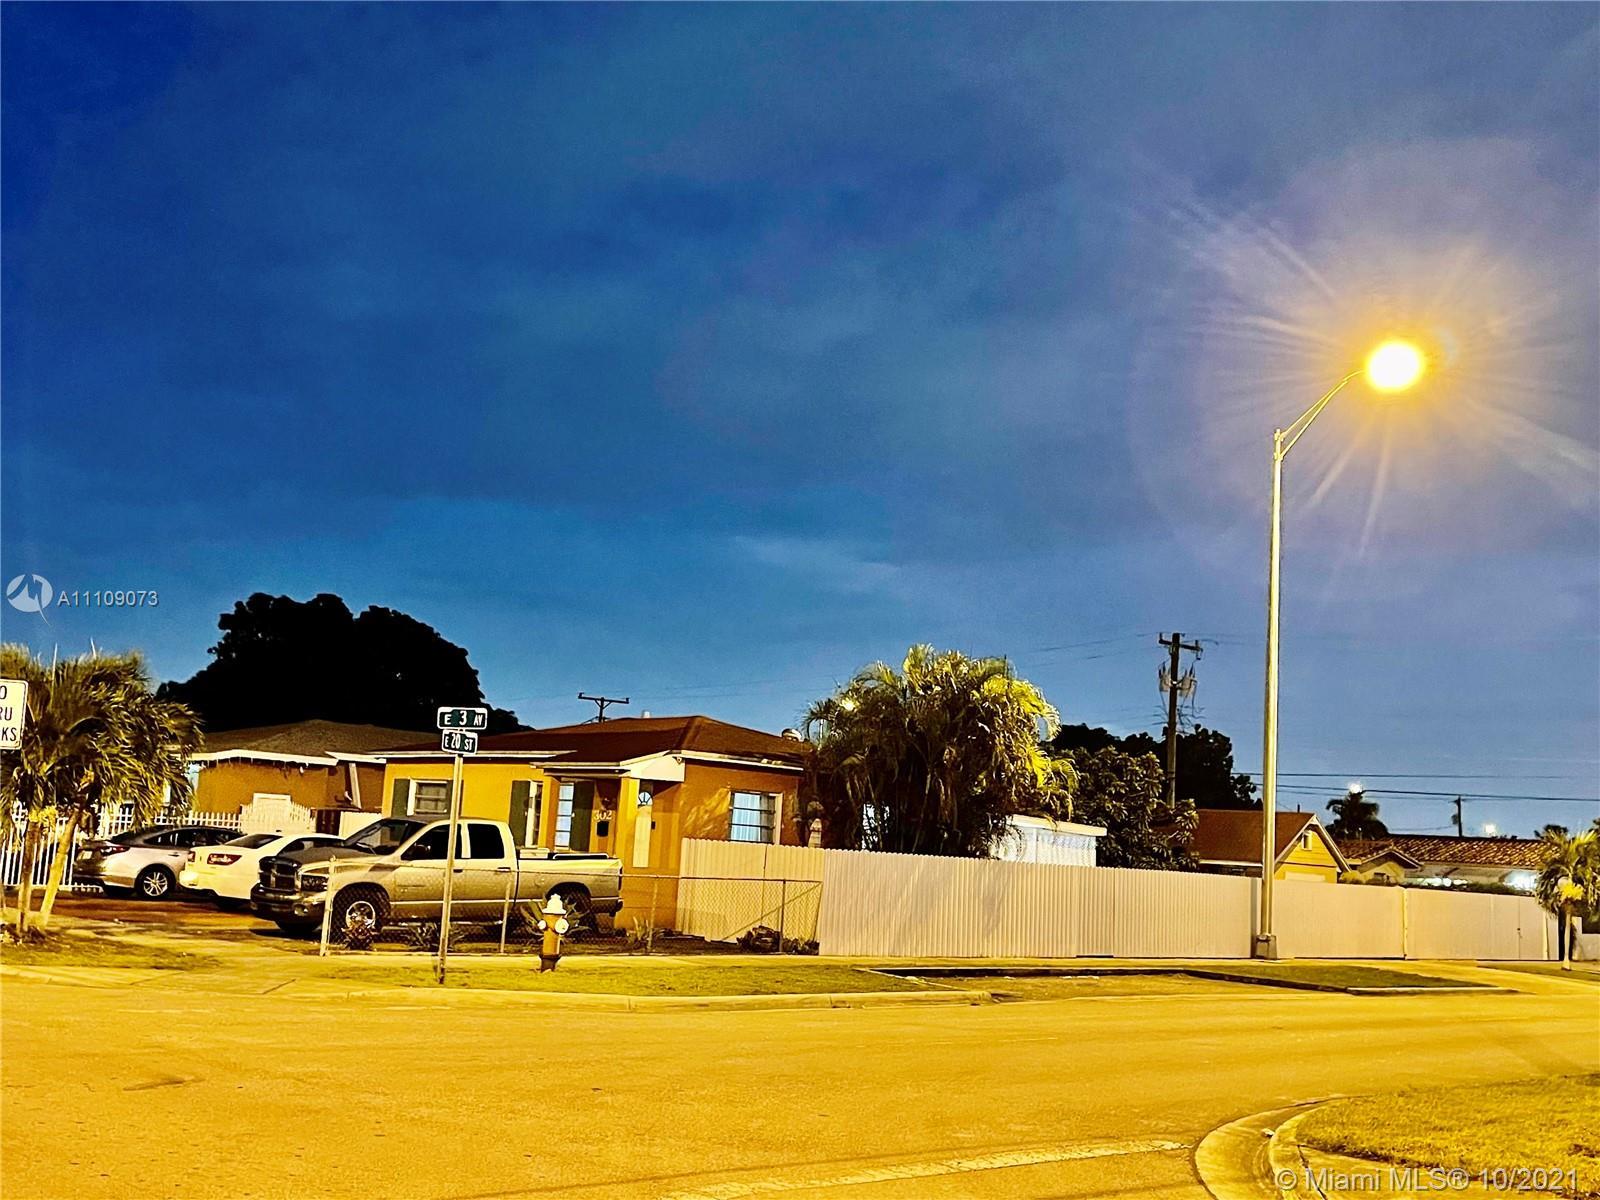 Single Family Home,For Sale,302 E 20th St, Hialeah, Florida 33010,Brickell,realty,broker,condos near me